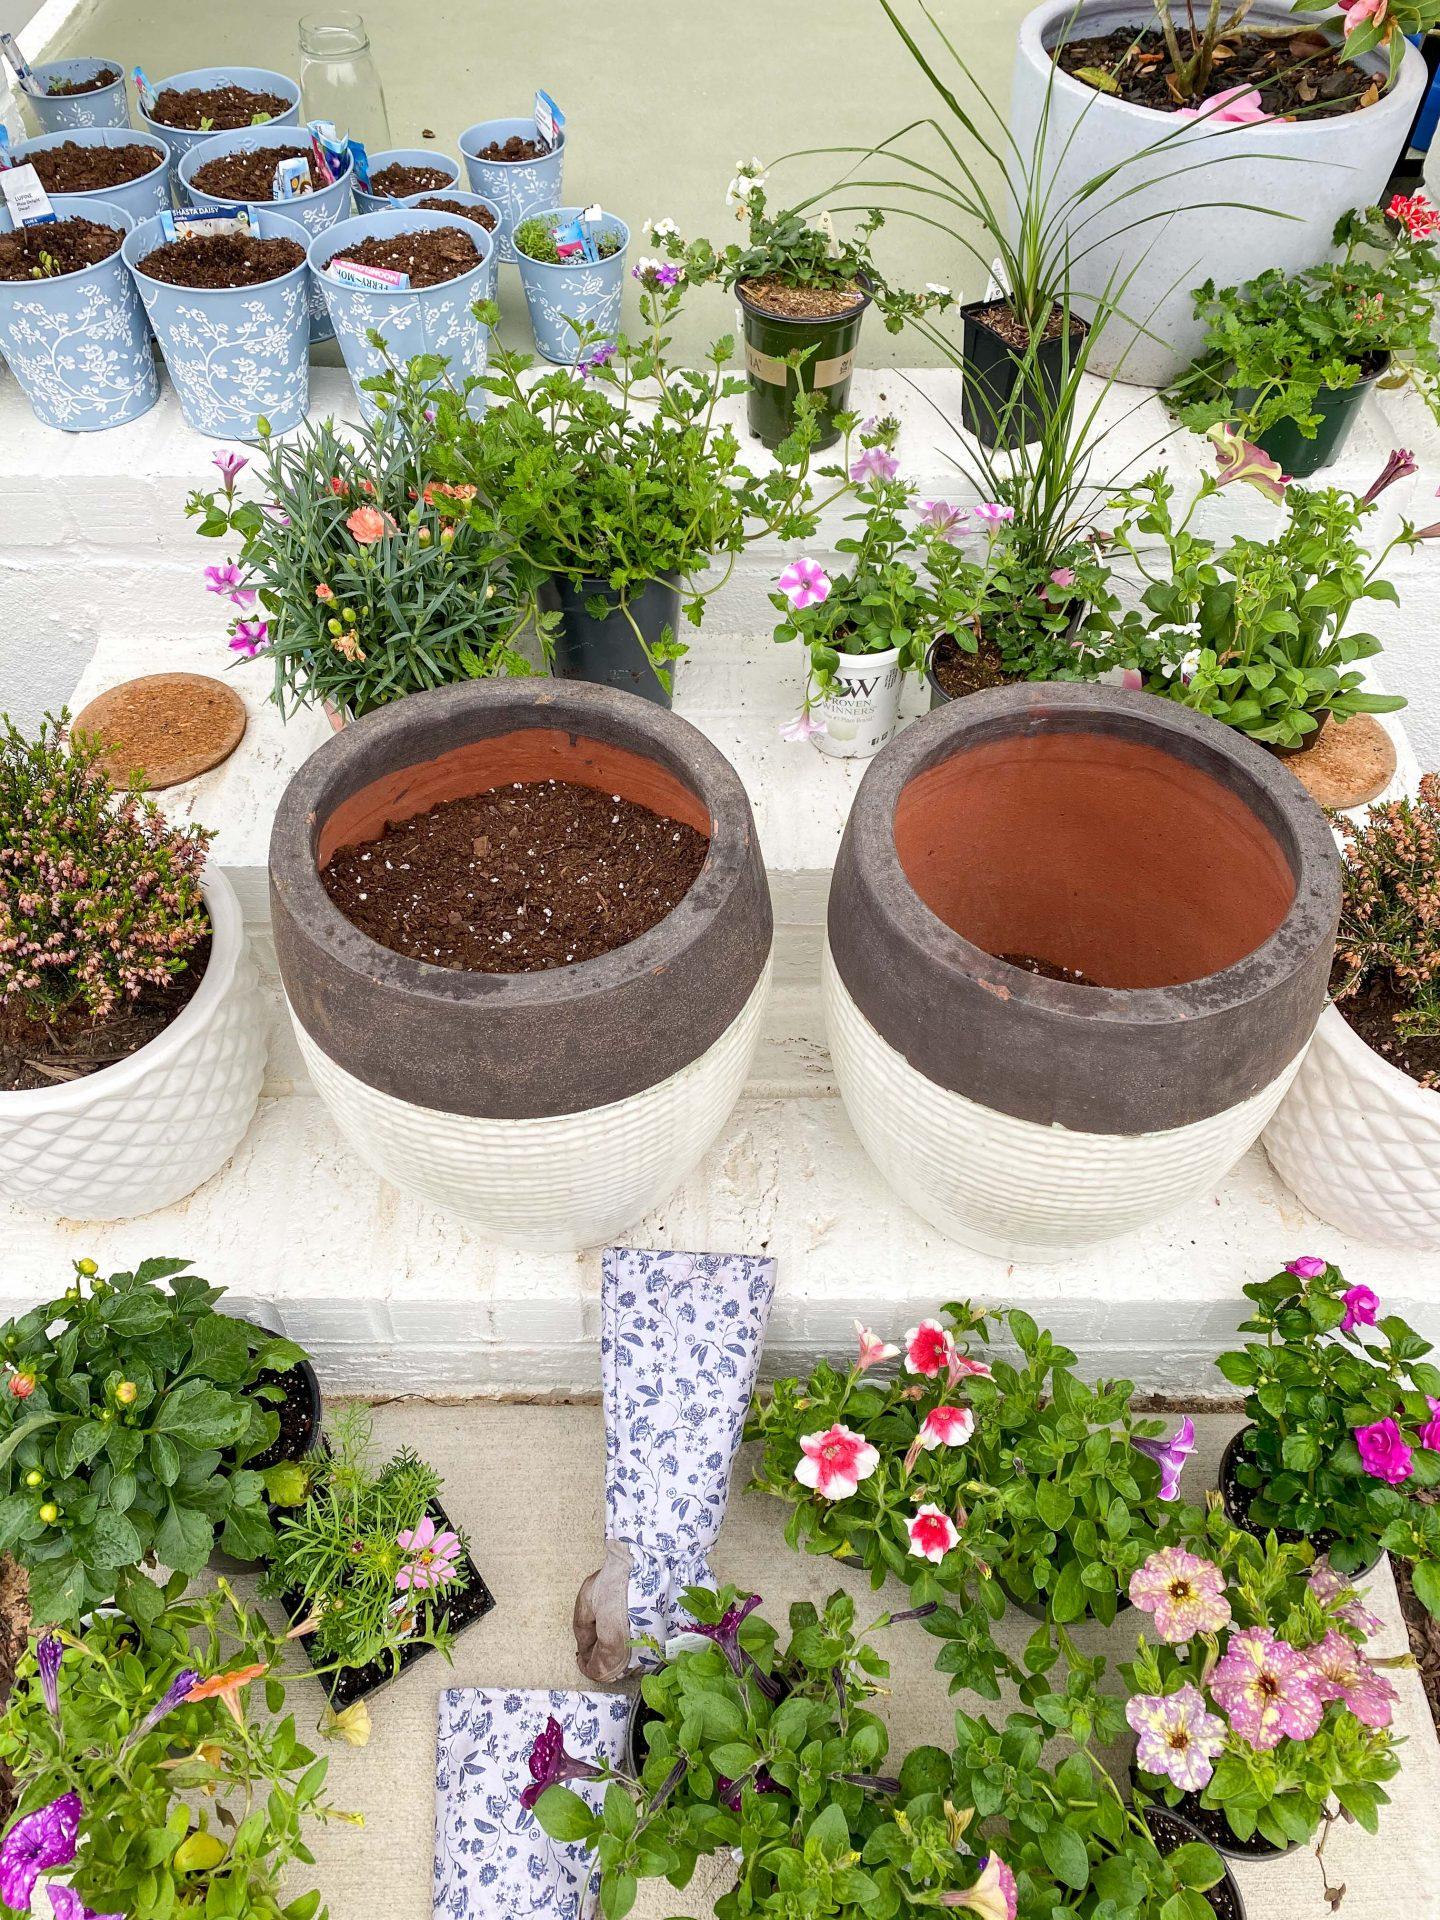 Wilsons rock hill nursery, rock hill, South Carolina, flowers, garden center, potting, pots, flowers, front porch